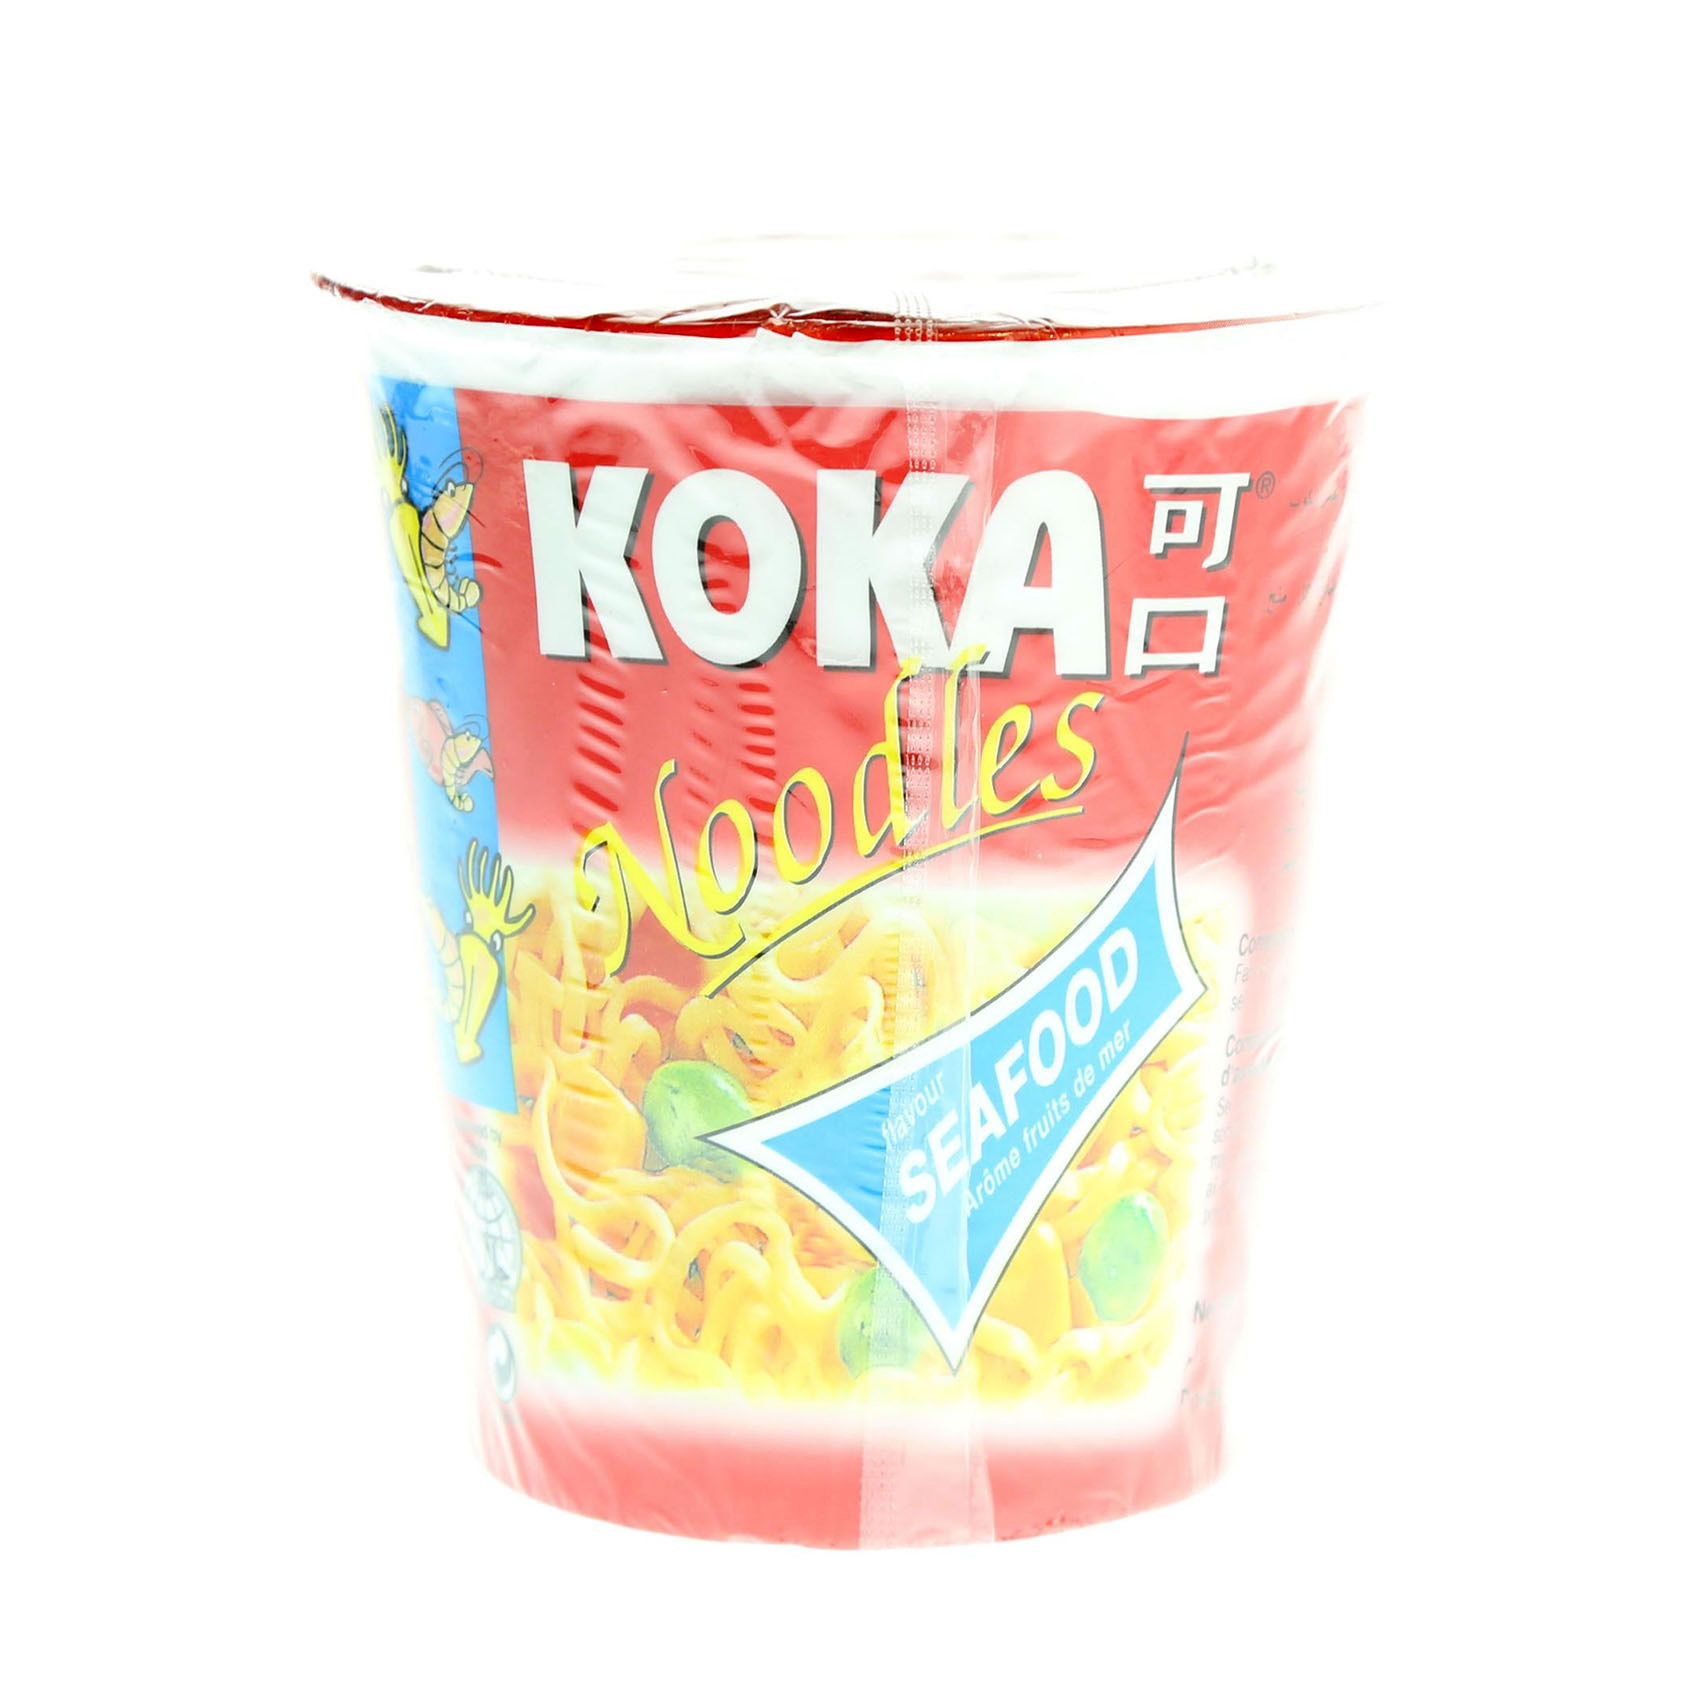 KOKA CUP NOODLES SEAFOOD 70GR